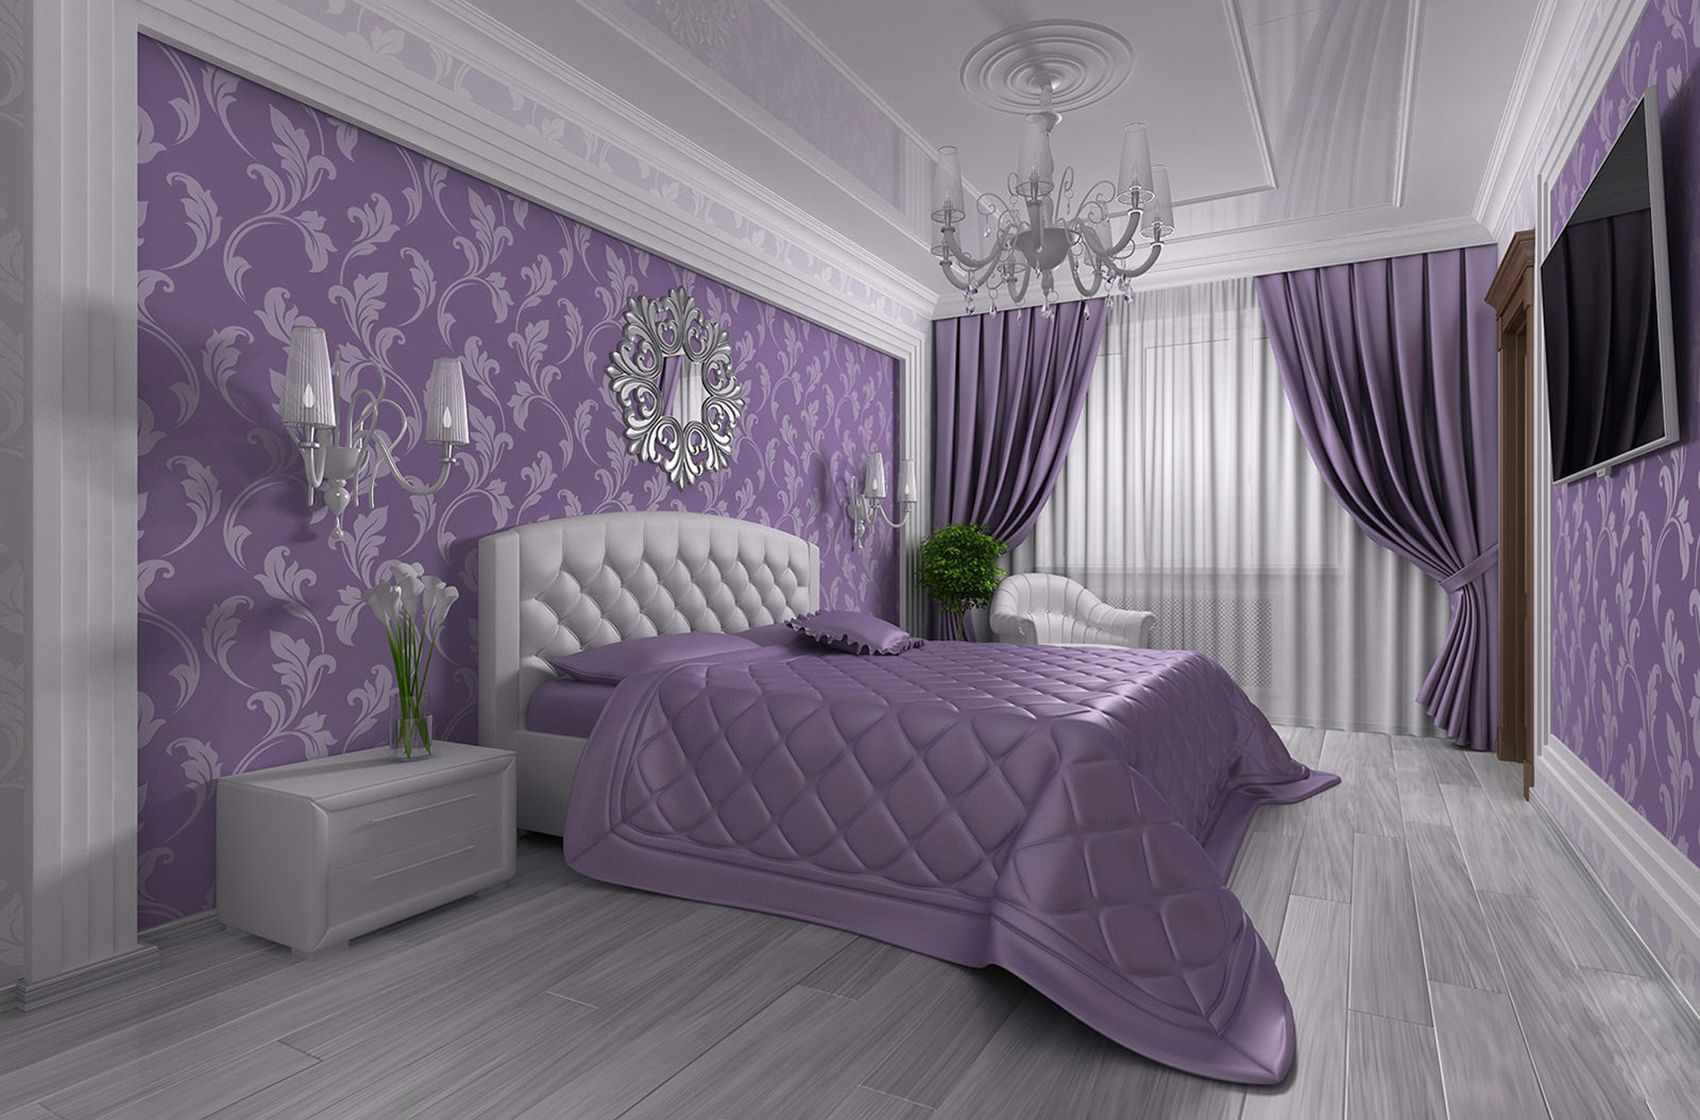 пример красивого стиля спальни